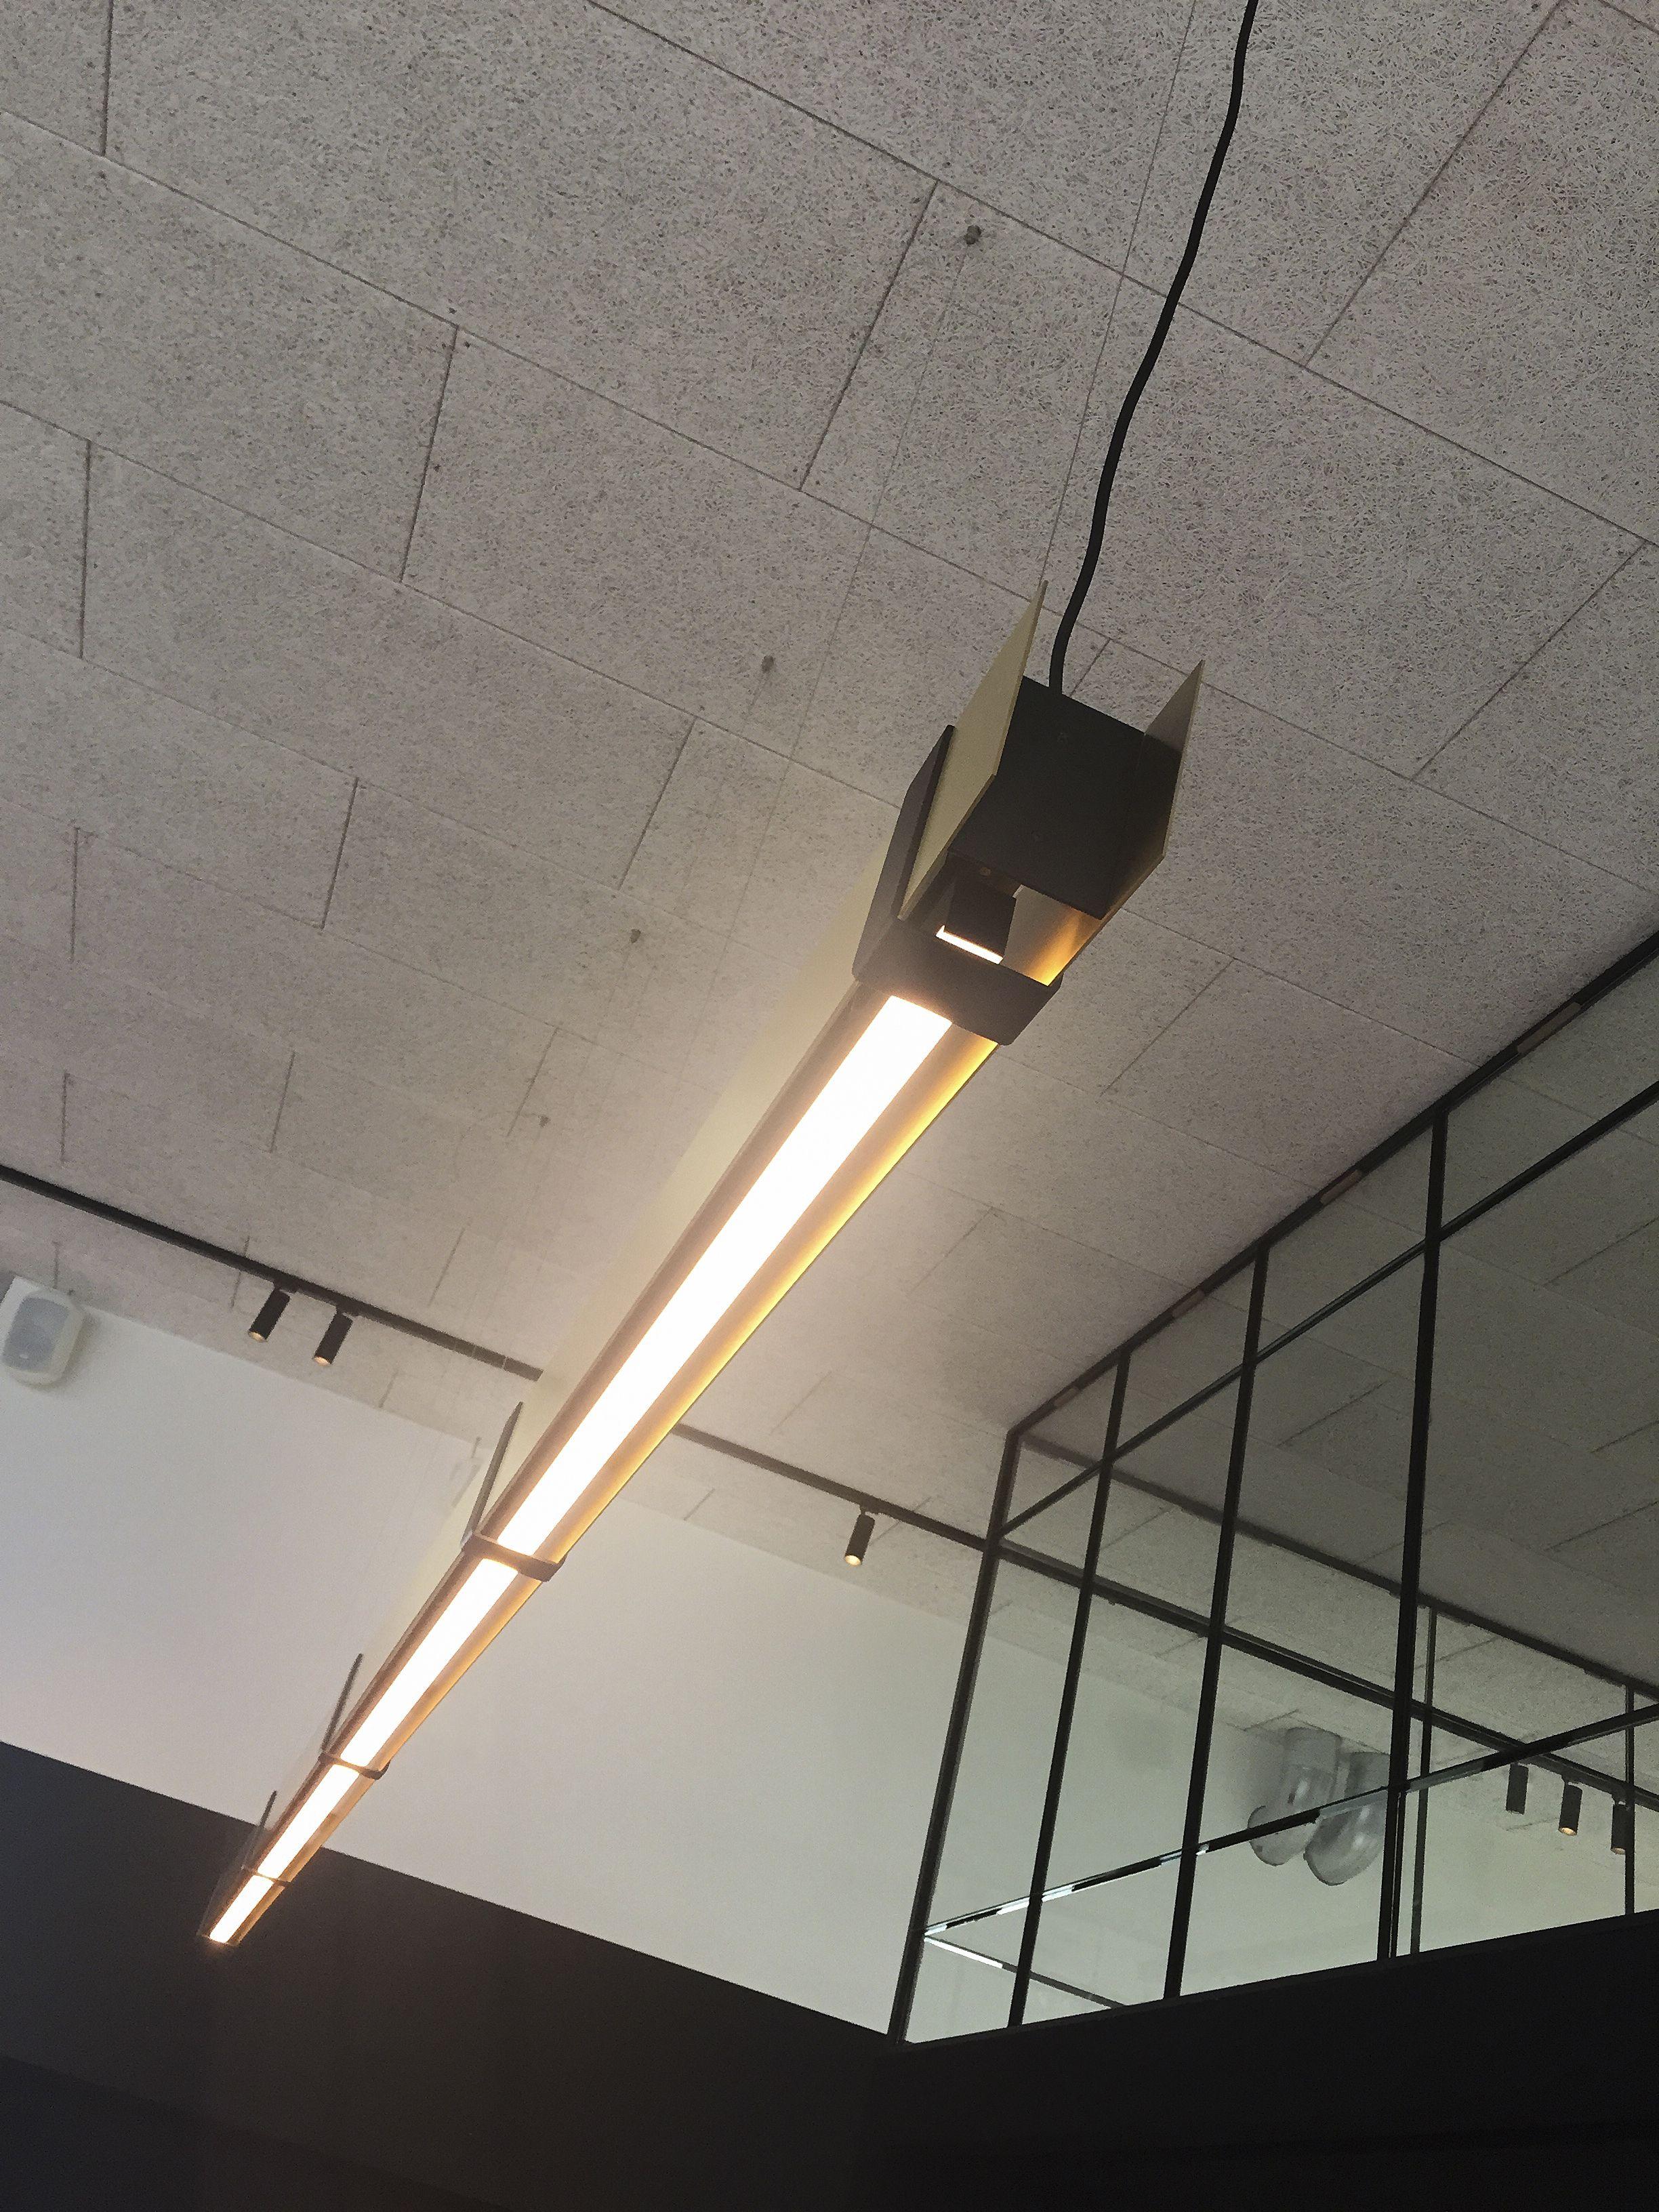 Mr Beam Dark Lighting Special Messing Profile Suspended